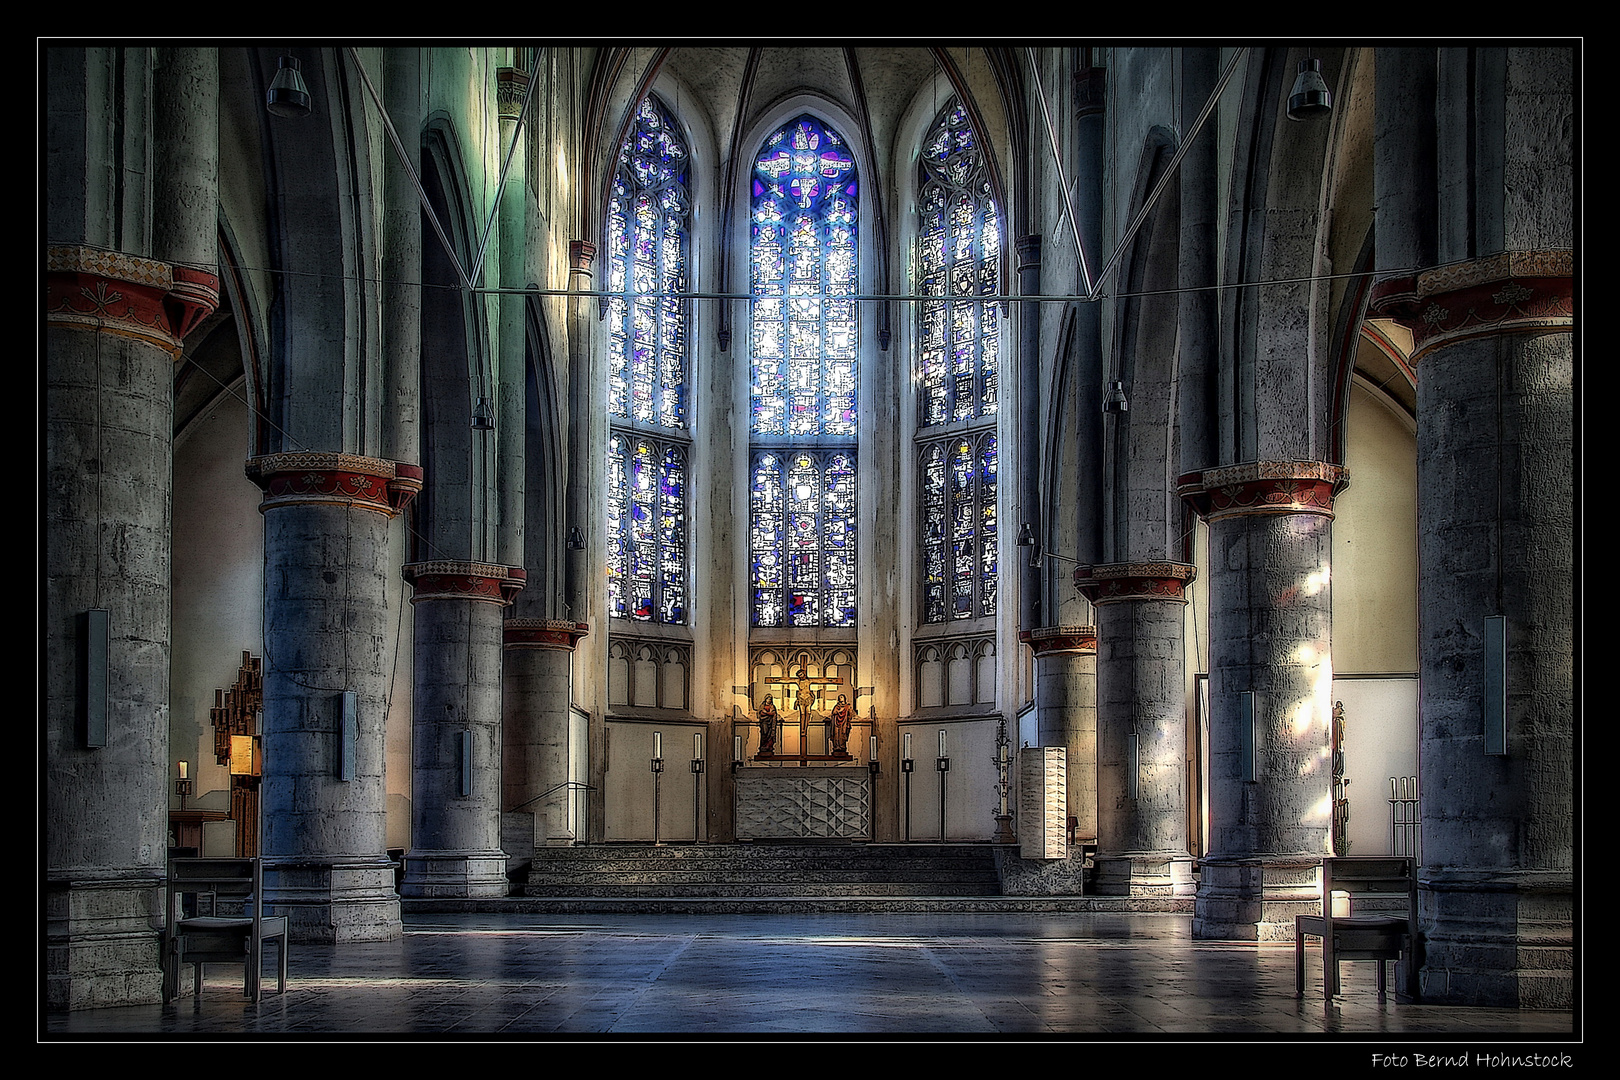 Citykirche ... Mönchengladbach